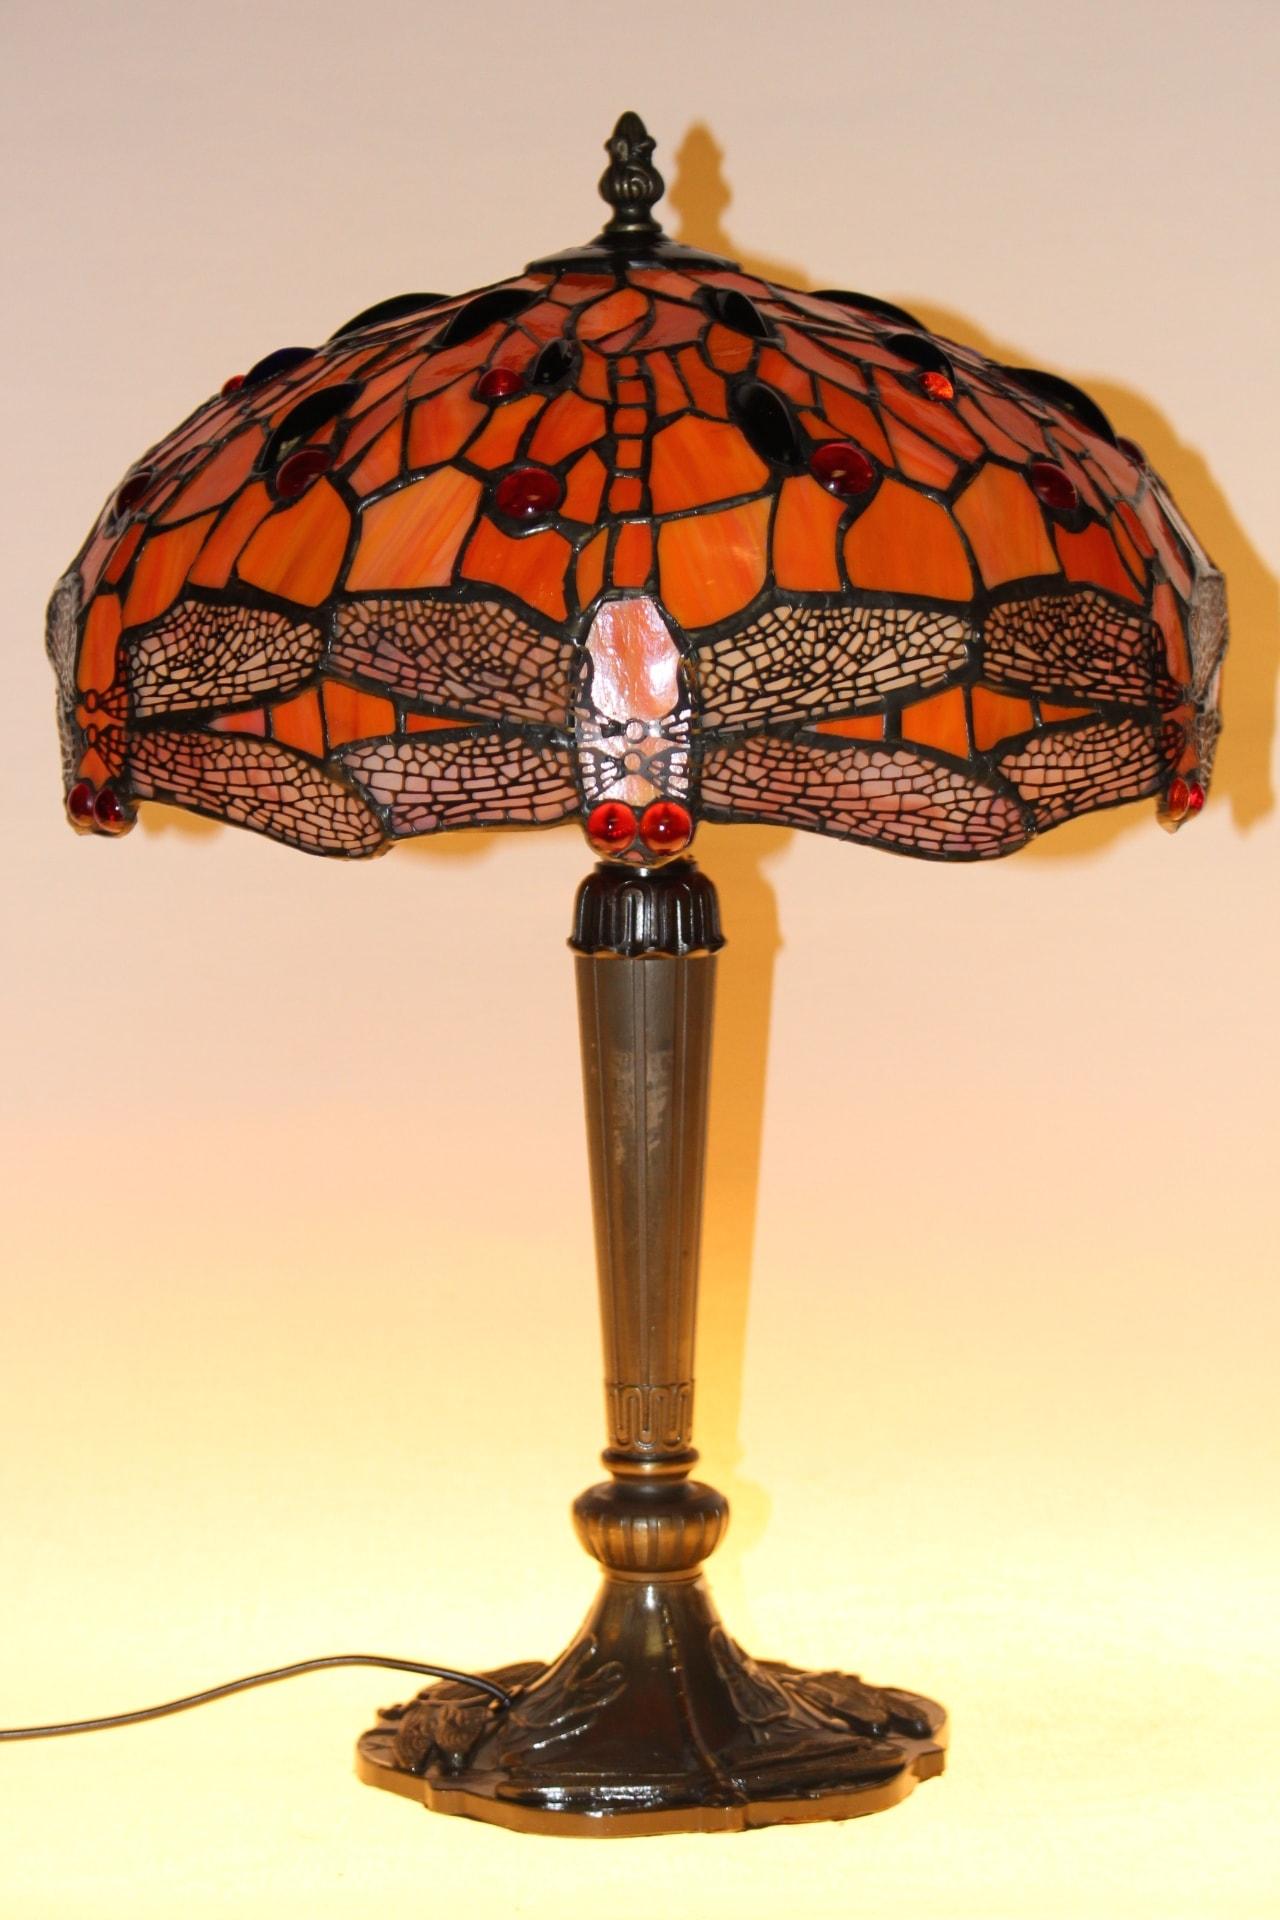 tiffany lampe 47cm selbstabholer zu kaufen auf asian. Black Bedroom Furniture Sets. Home Design Ideas